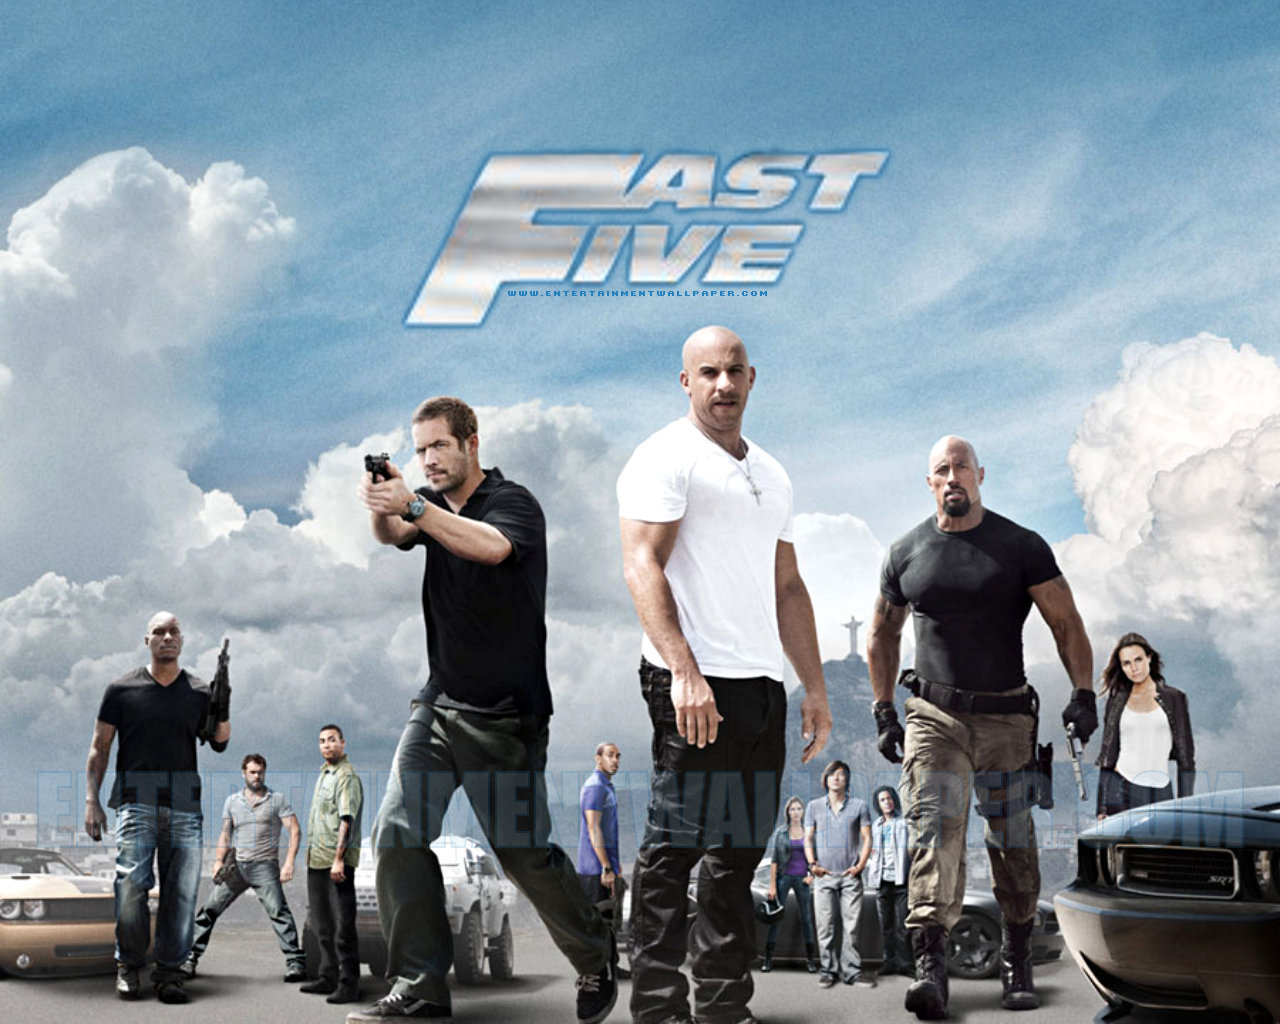 fast five wallpaper 10026064 size 1280x1024 more fast five wallpaper 1280x1024